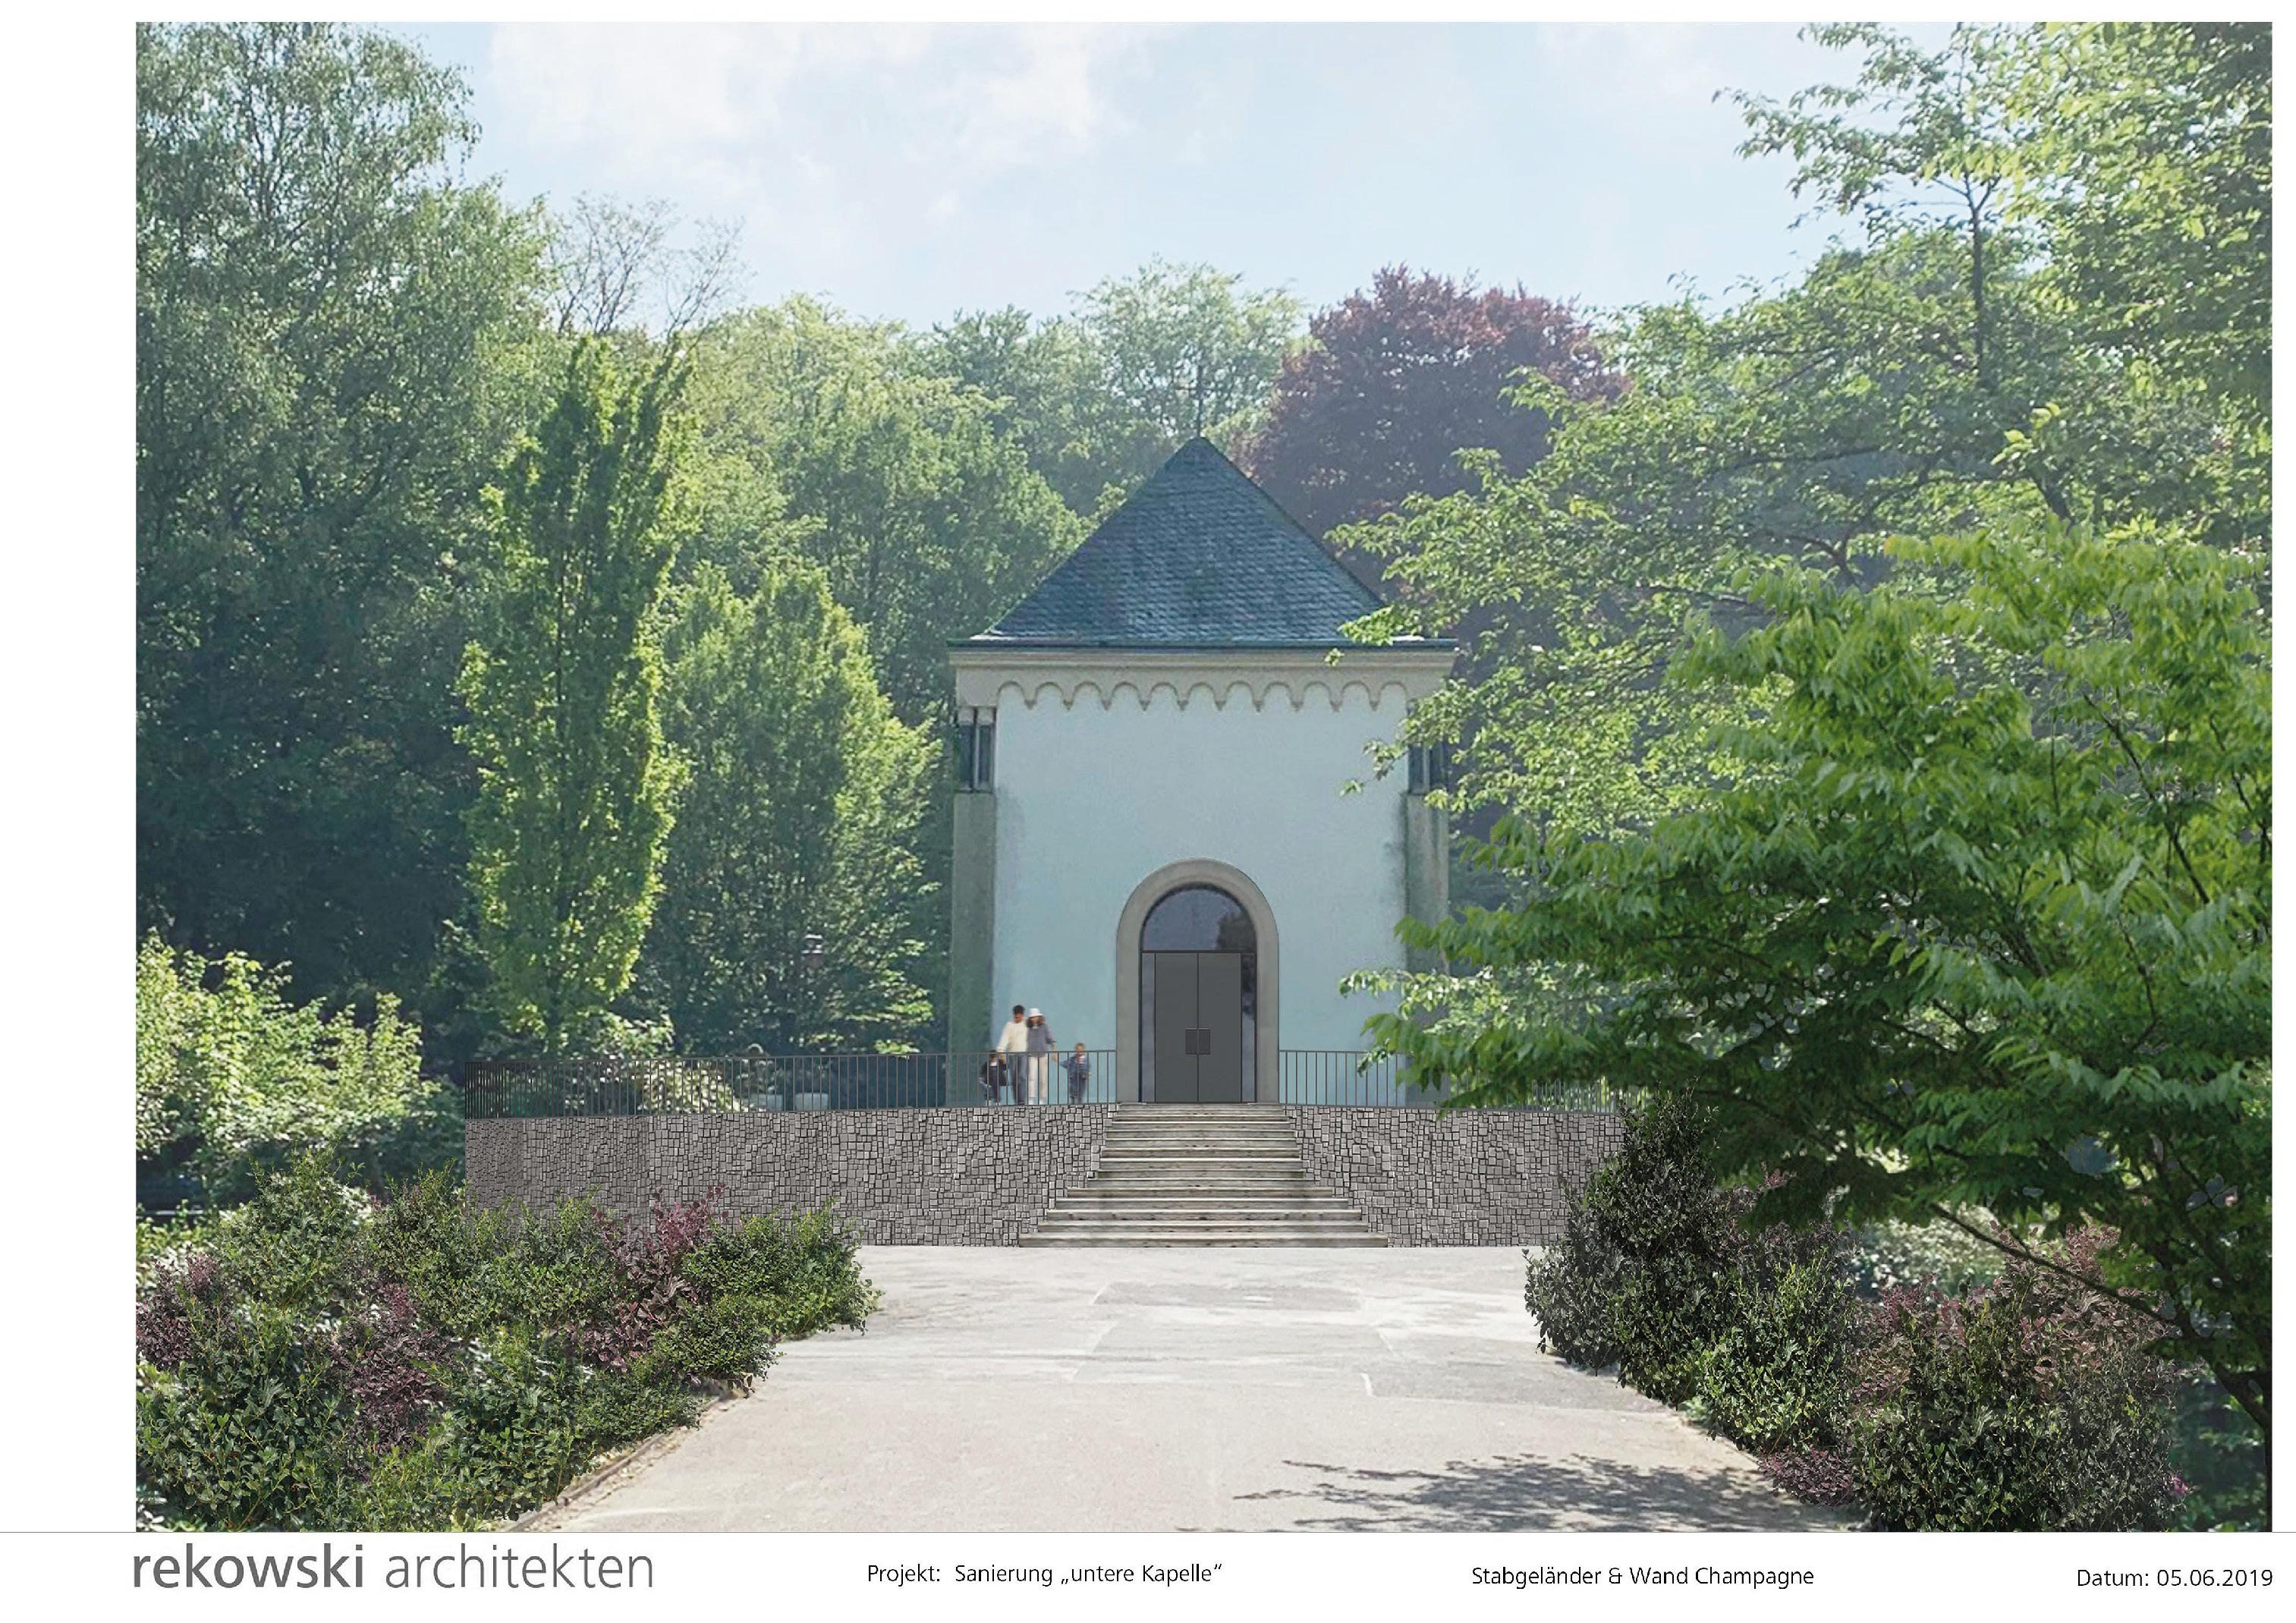 Untere Kapelle des Gerresheimer Friedhofs soll saniert werden